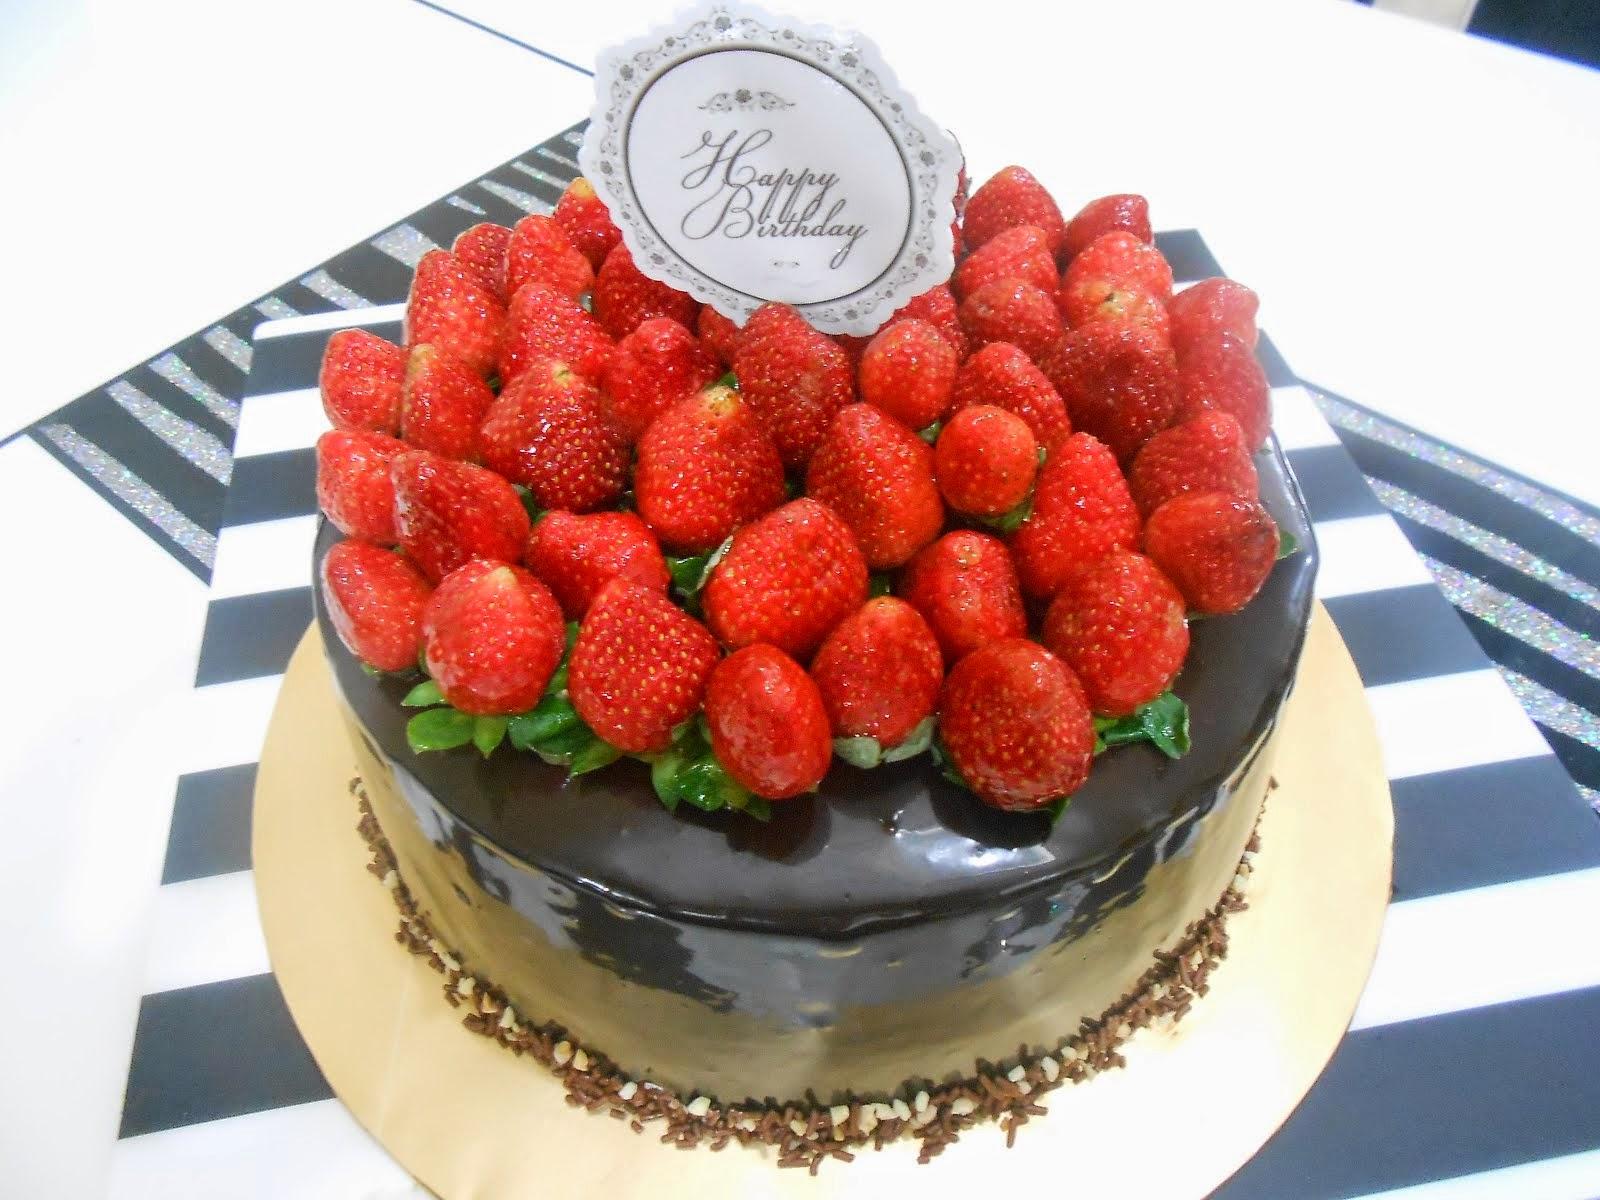 Moist chocolate cake 2 kilo